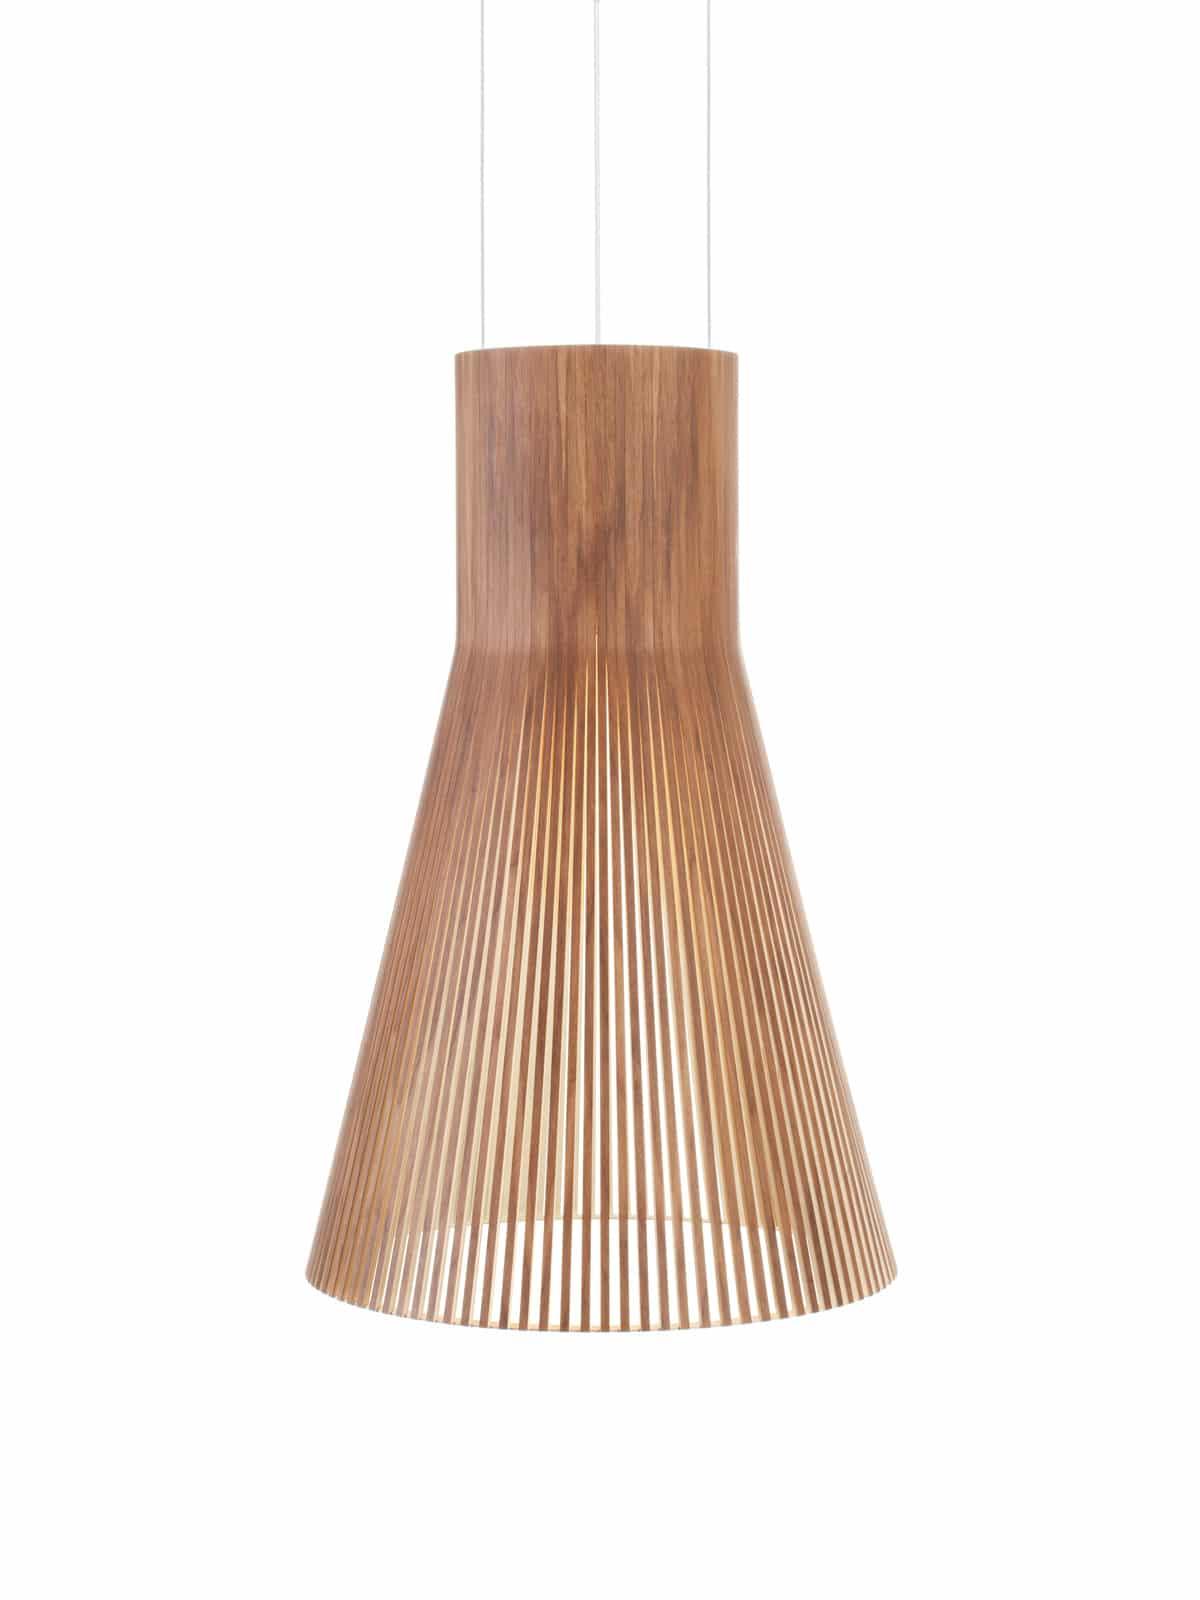 Magnum 4202 Holzleuchte DesignOrt Secto Design